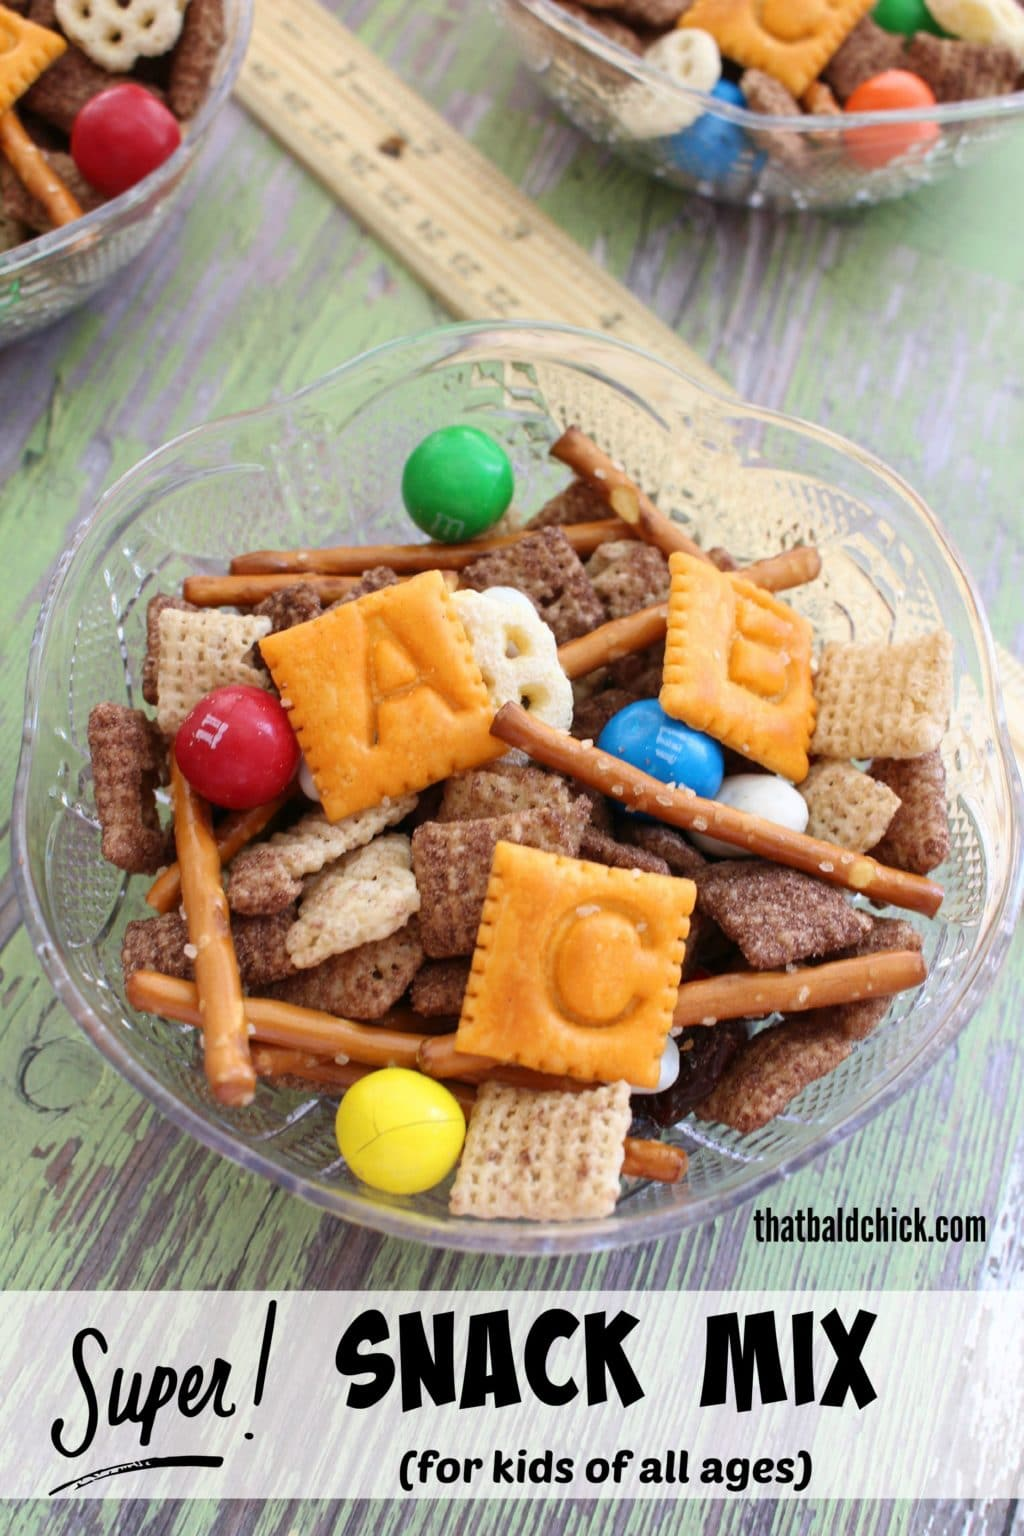 Super Snack Mix Recipes @thatbaldchick